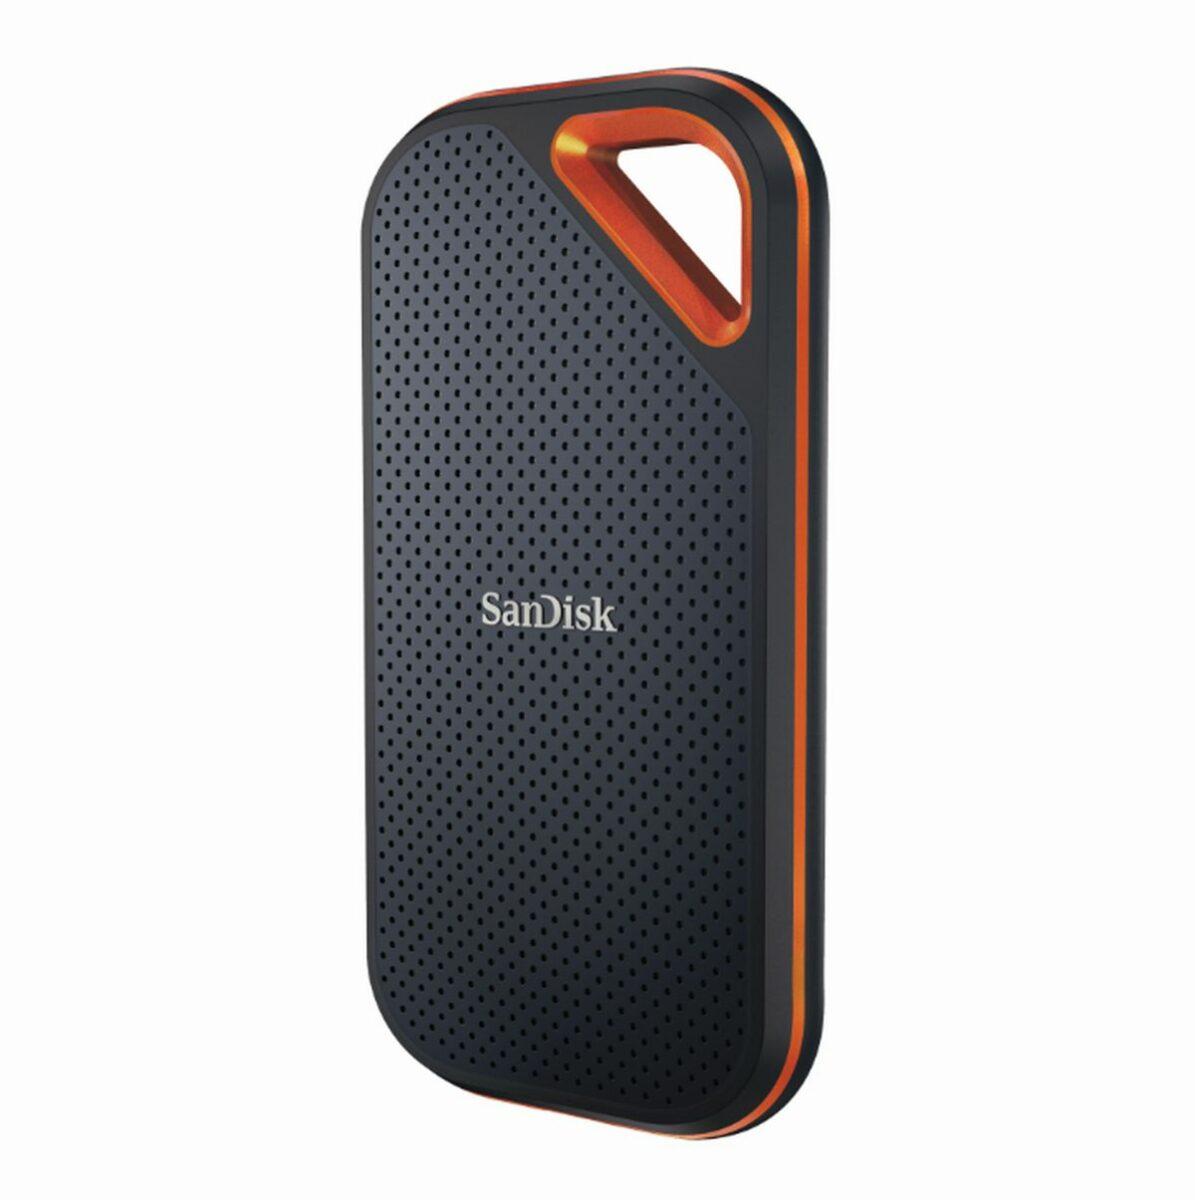 SanDisk Extreme PRO Portable SSD 2019: Kinerja Lebih Kencang, Kapasitas Hingga 2TB 17 harga, sandisk, SanDisk Extreme PRO Portable SSD 2019, spesifikasi, ssd portabel